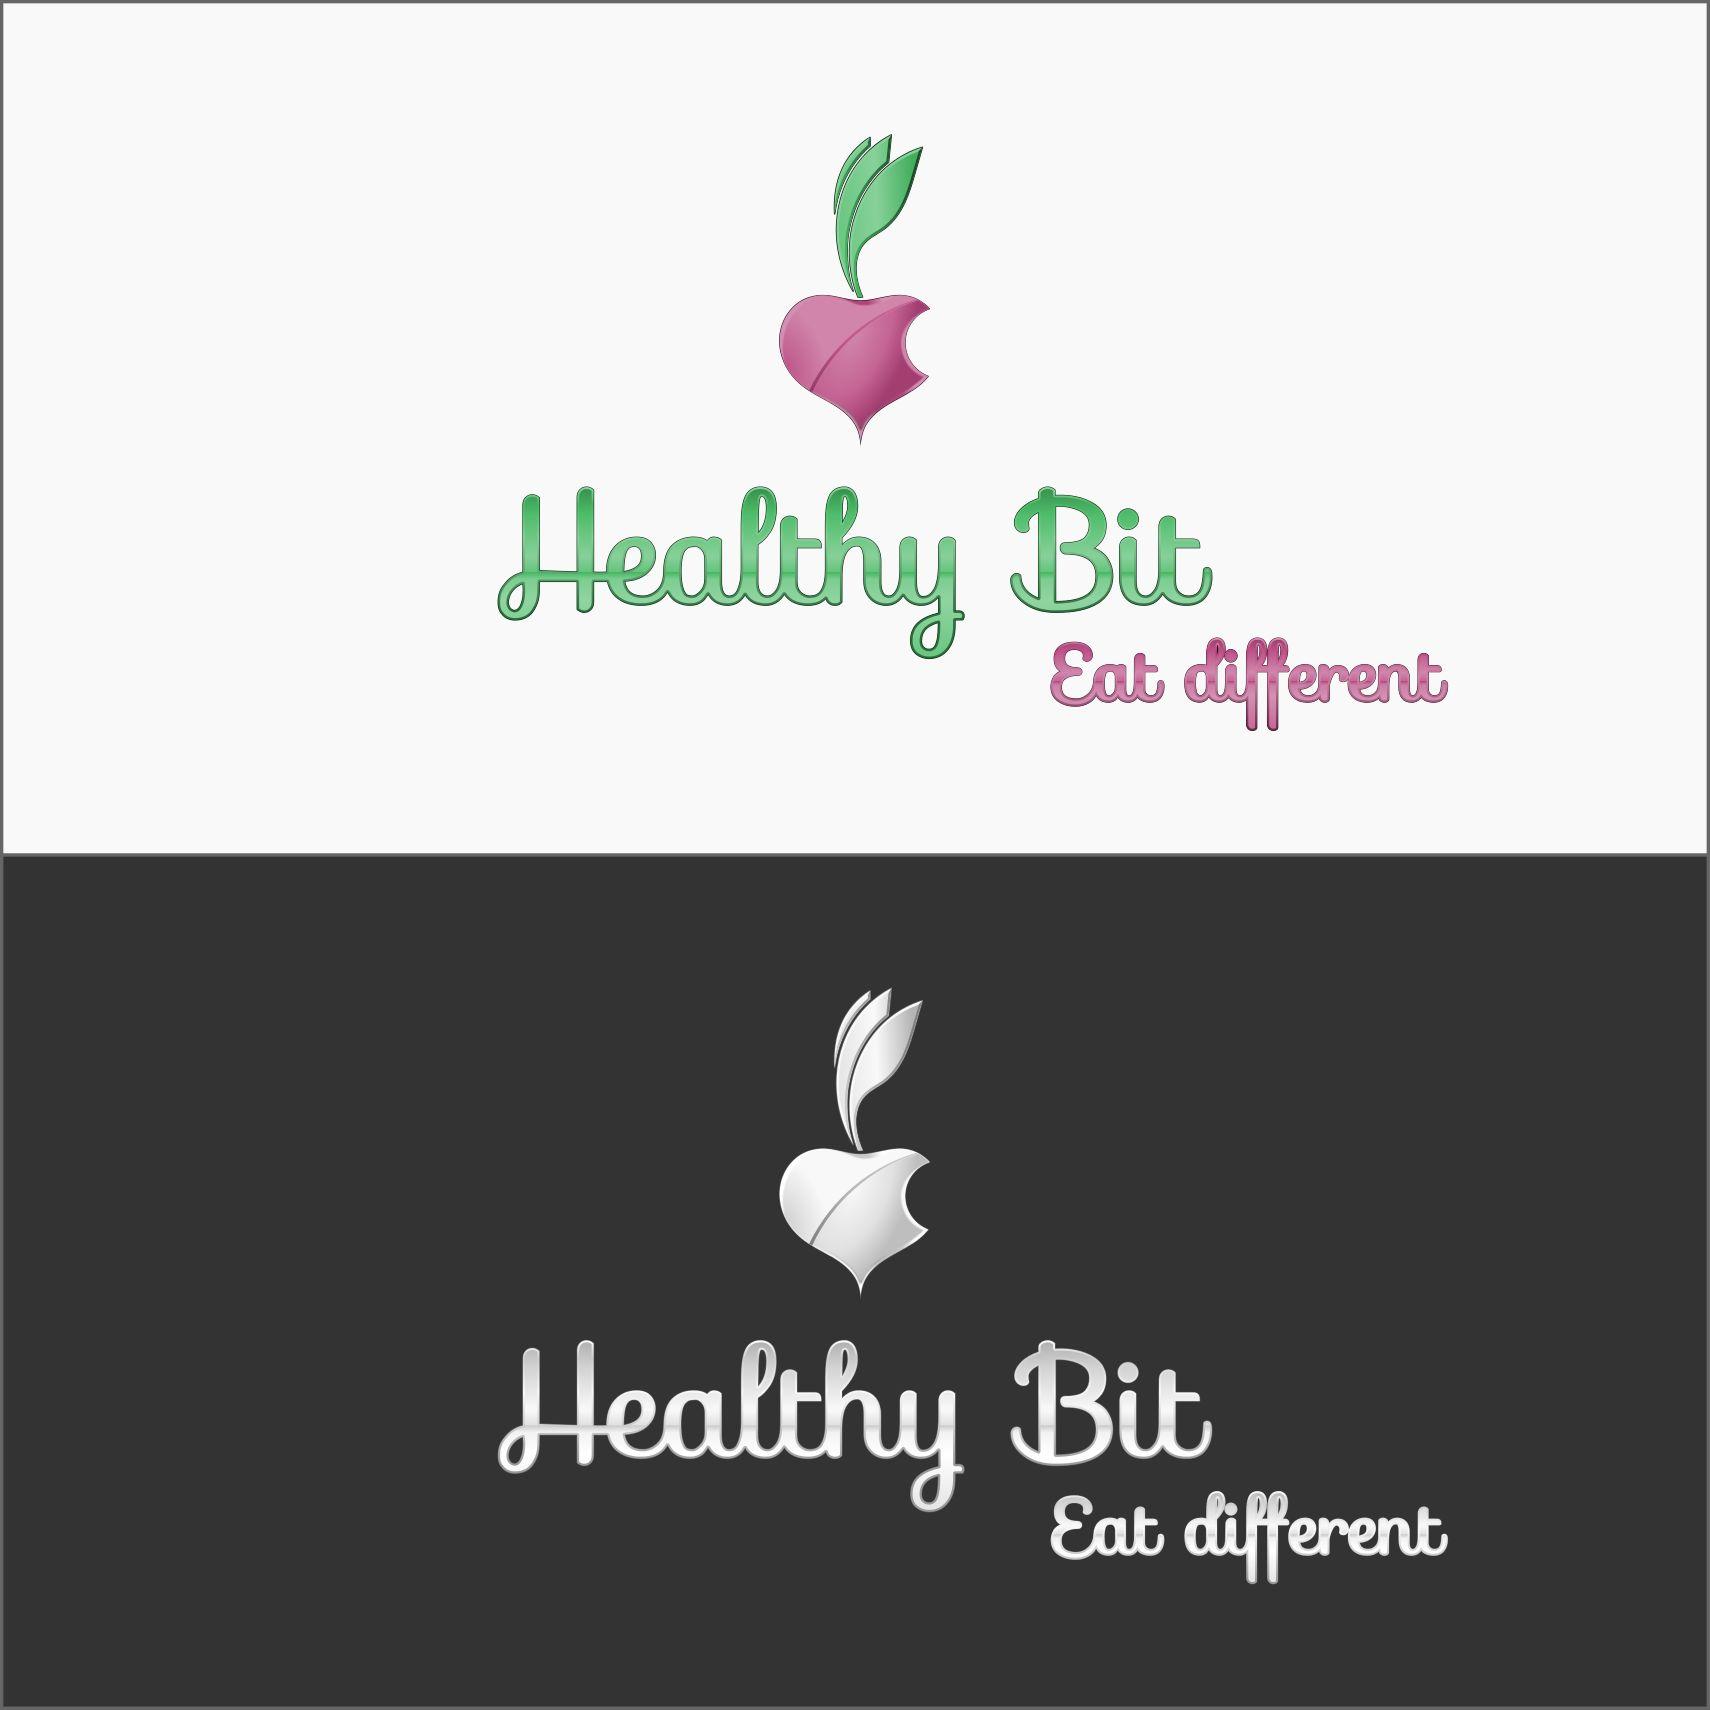 Healthy Bit или Healthy Beet - дизайнер waP9eloo